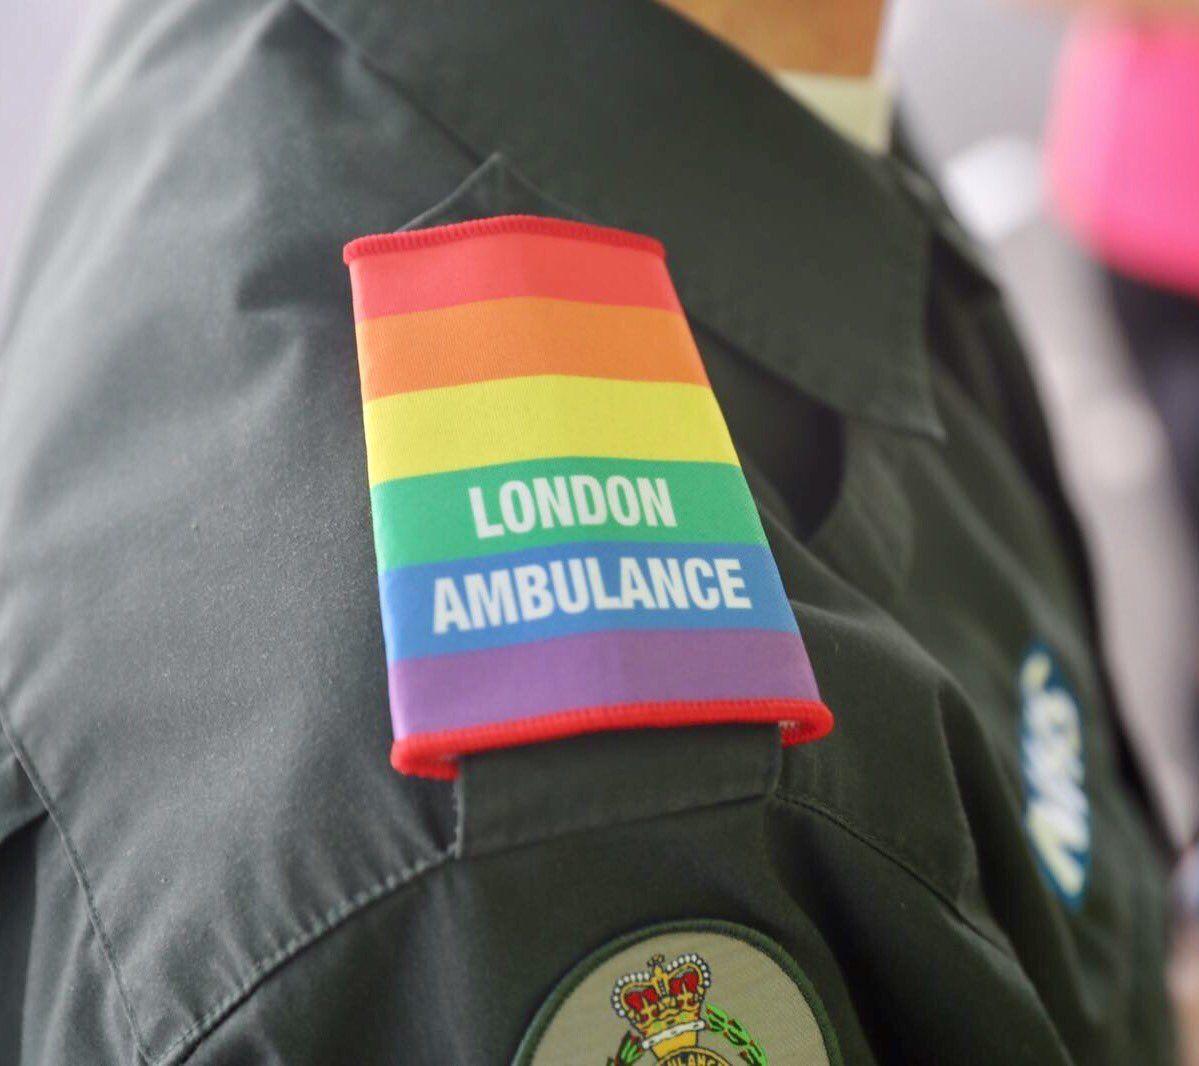 London Ambulance on Twitter: Follow our @LAS_LGBT account